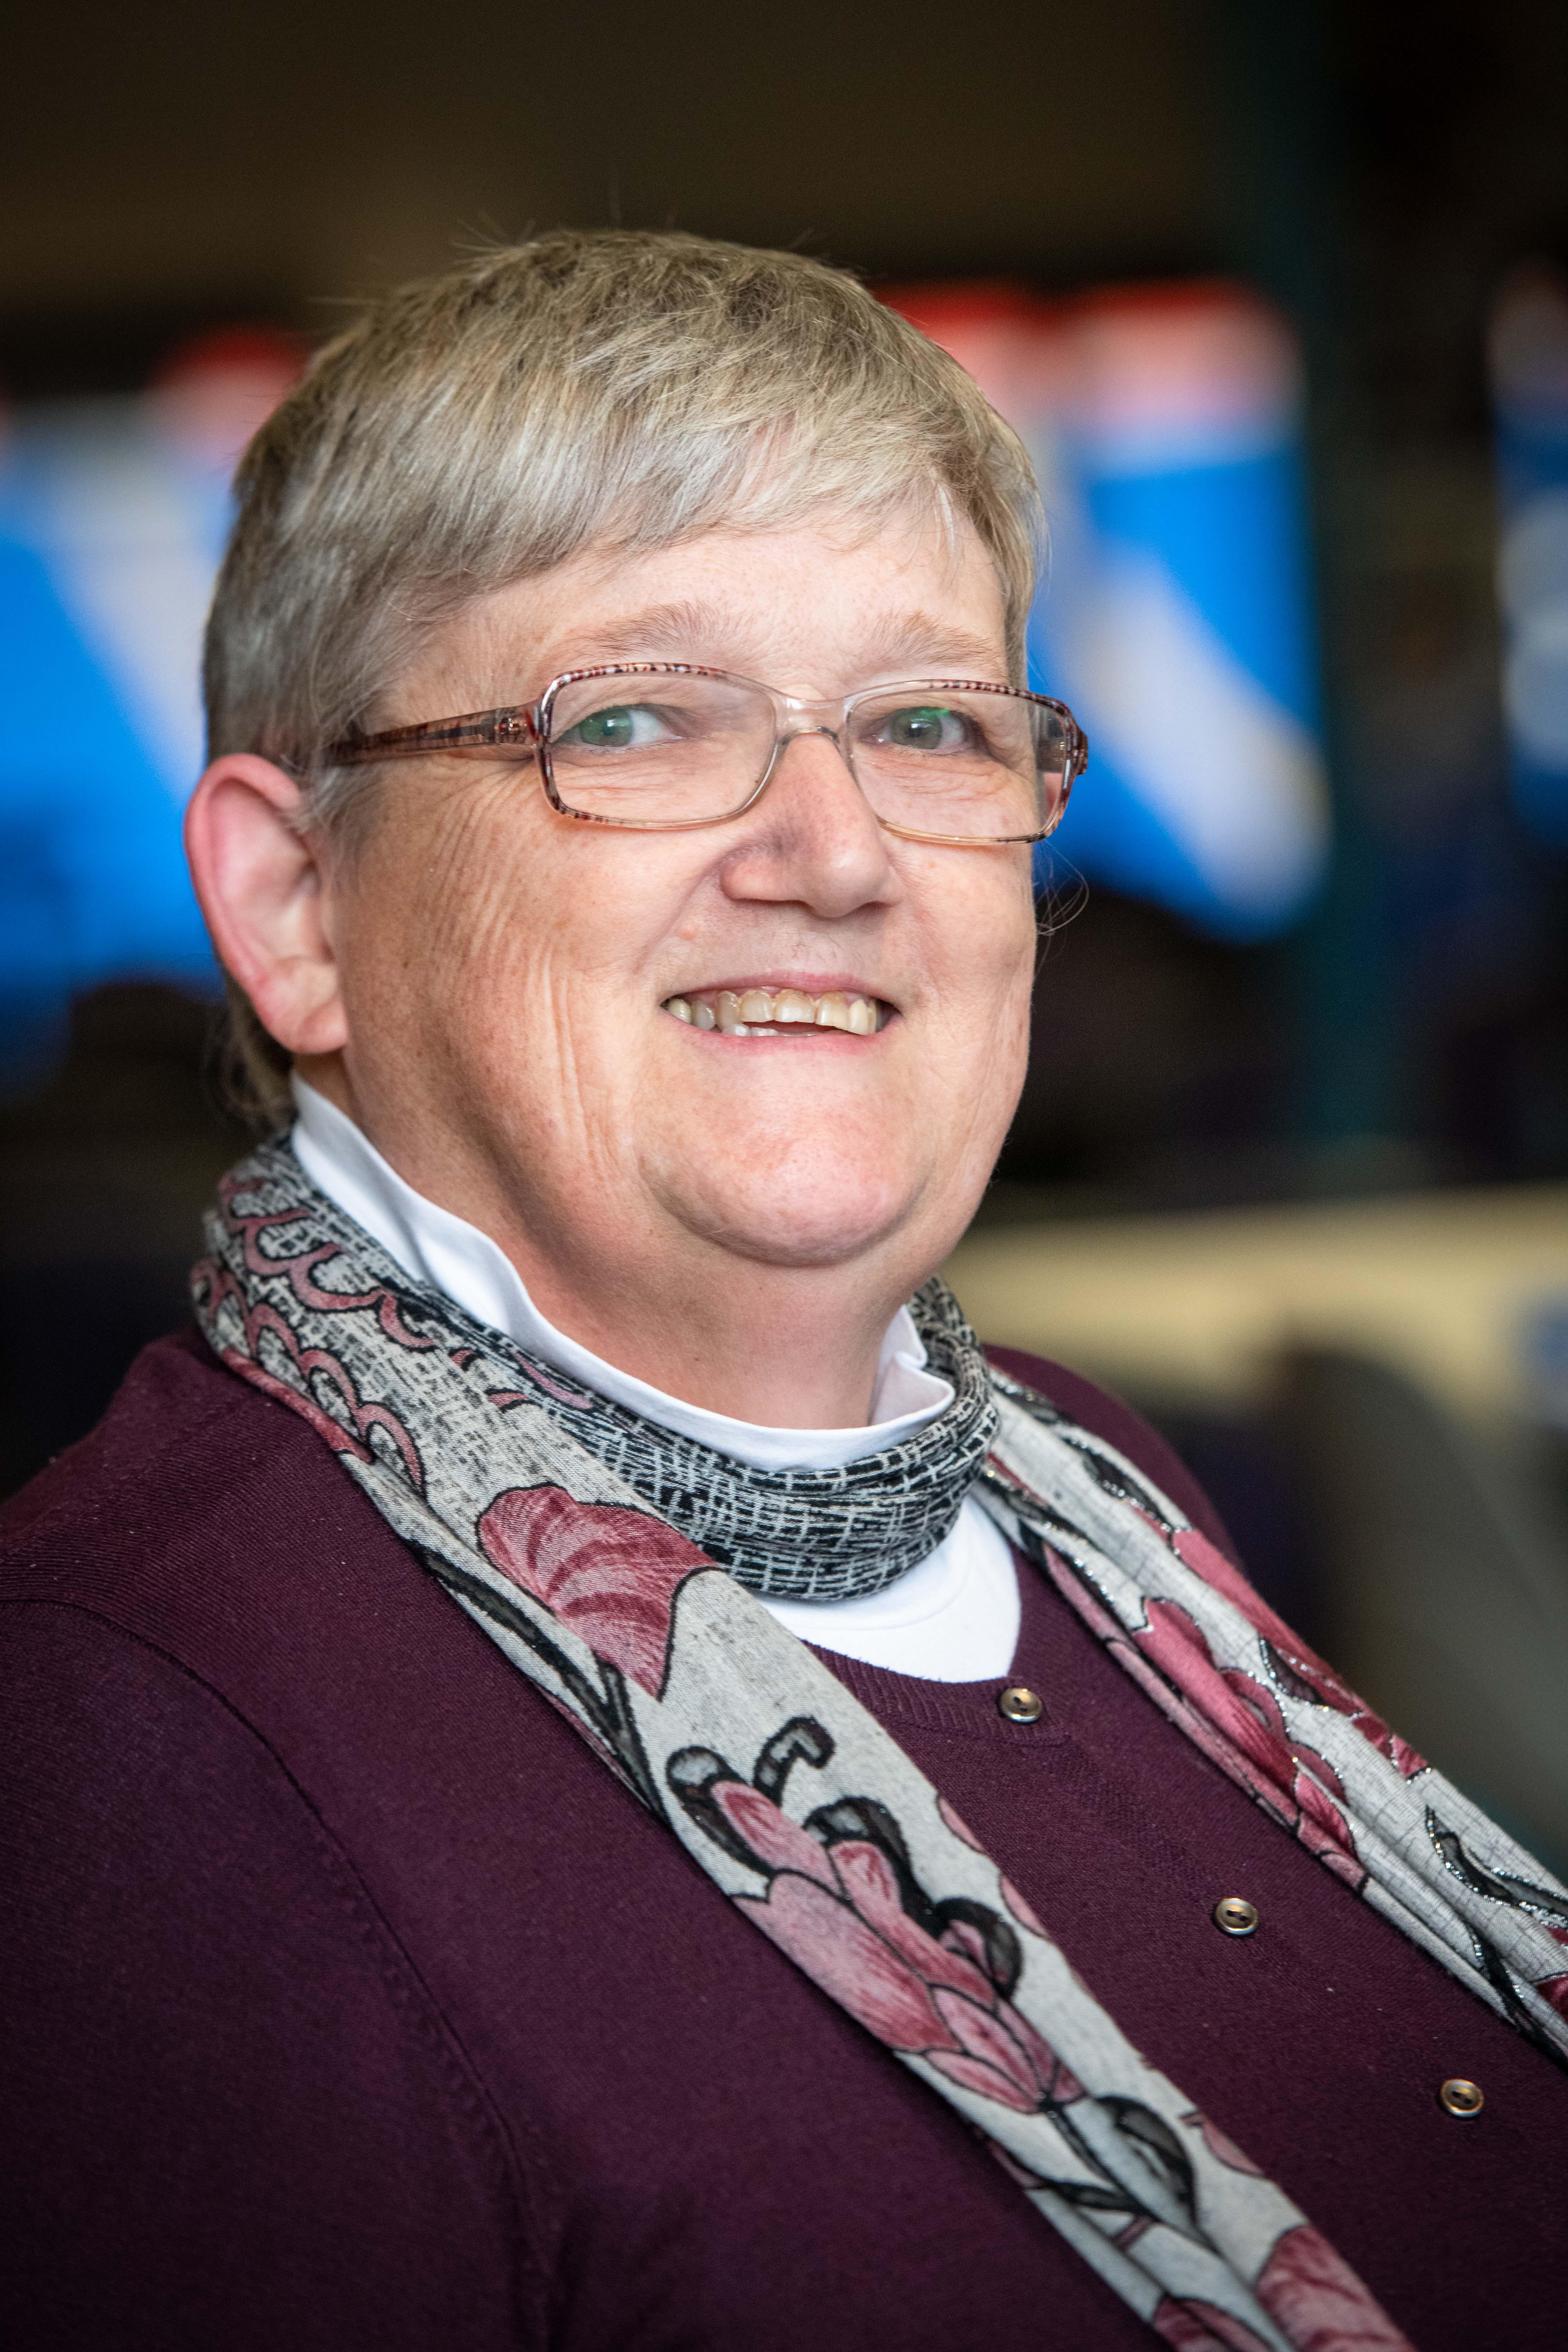 Mandi Glover, treasurer of the DW board